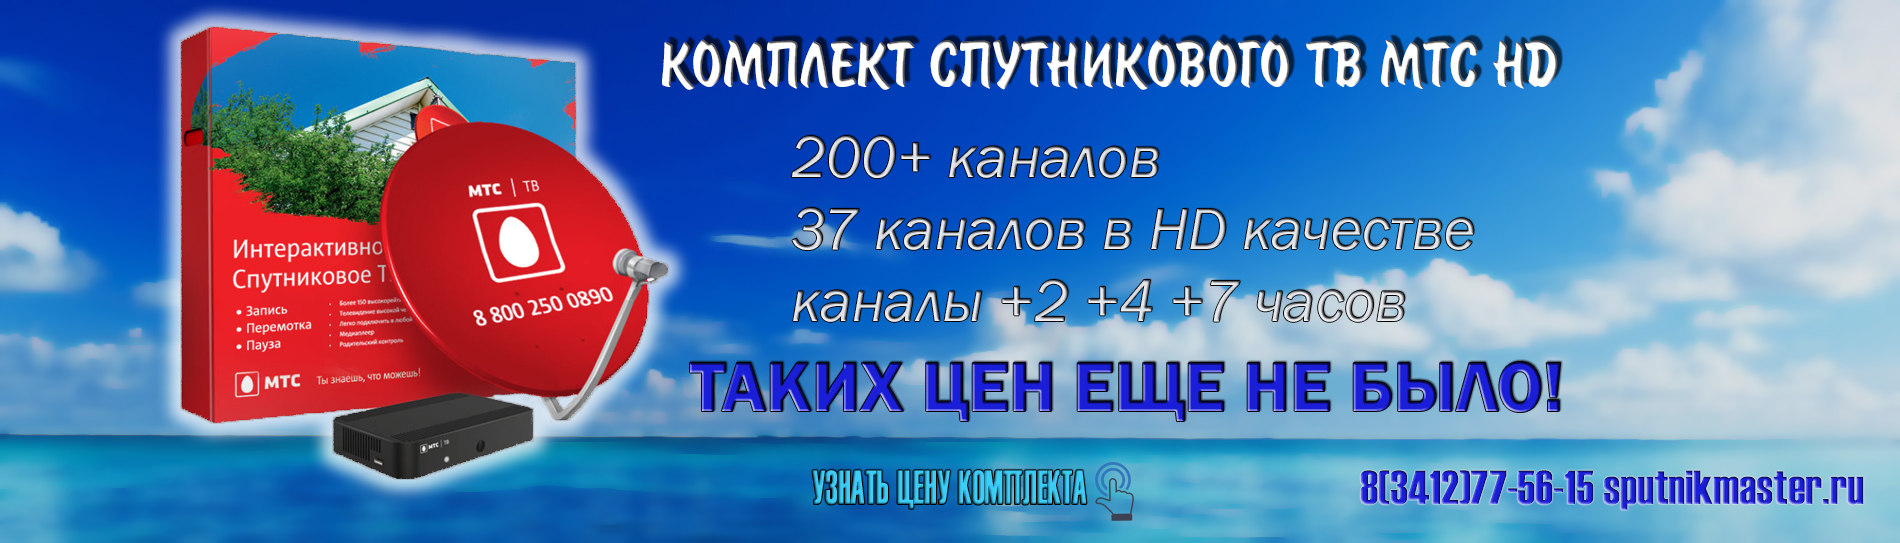 Комплект спутникового ТВ МТС Дешево